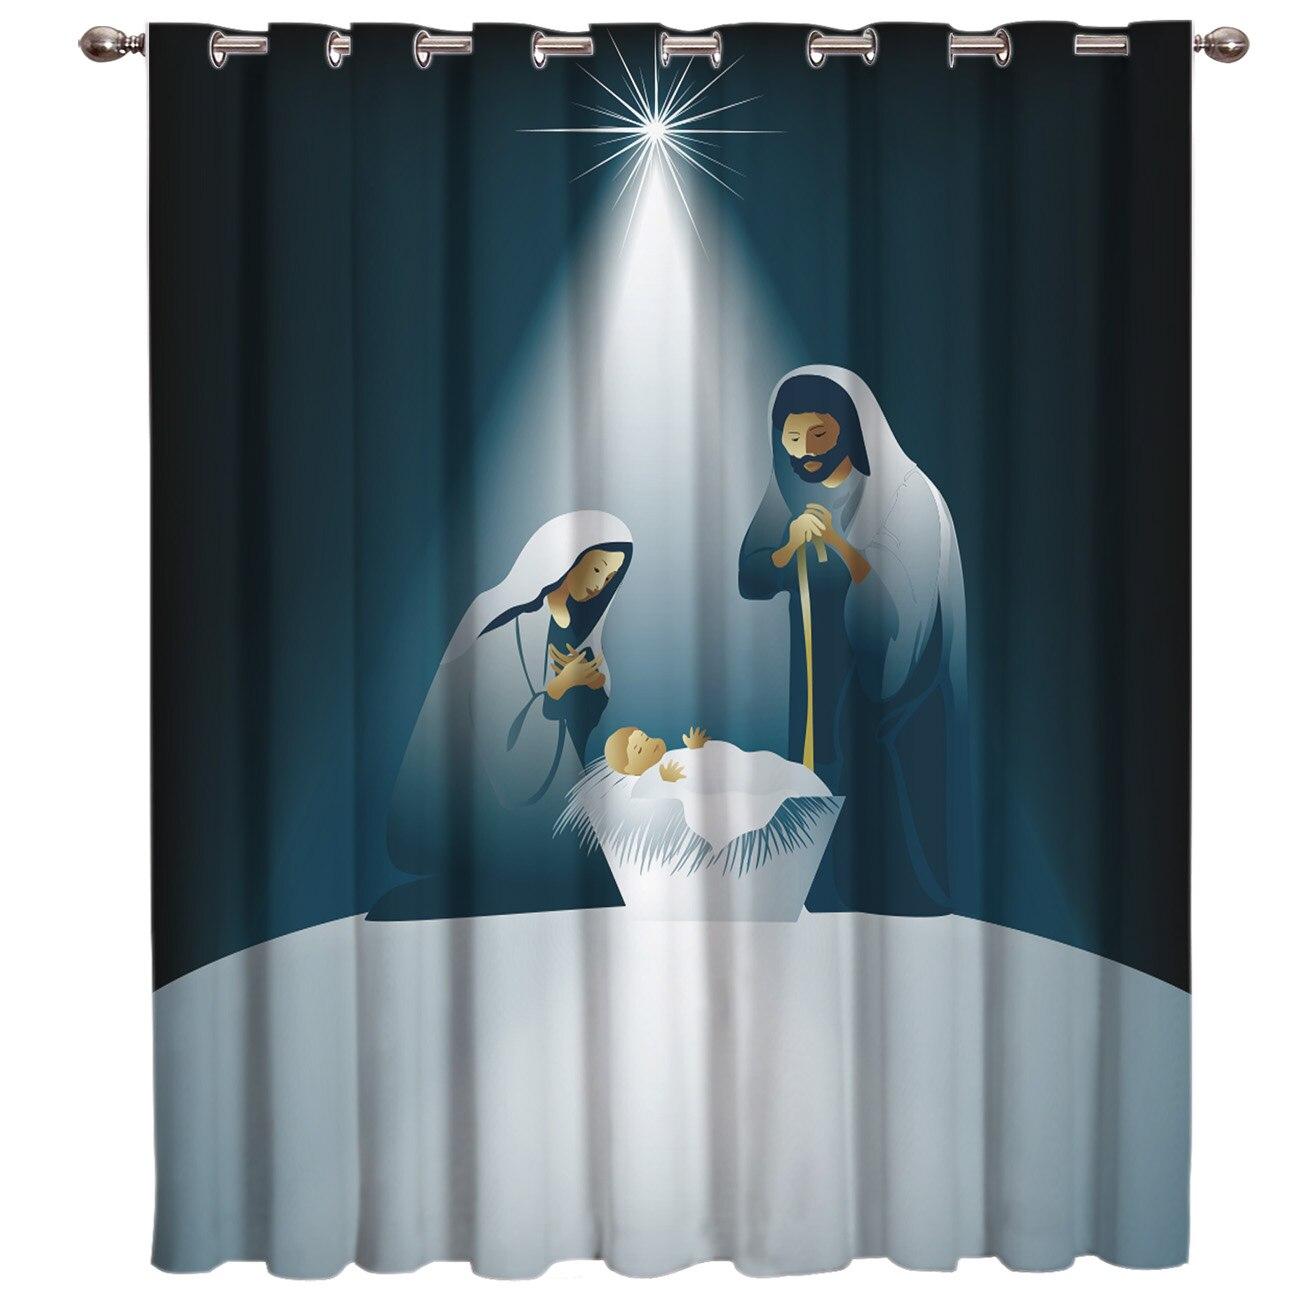 Christams Jesus Christ Snow Holiday Room Curtains Large Window Window Curtains Dark Curtain Lights Outdoor Indoor Fabric Kids